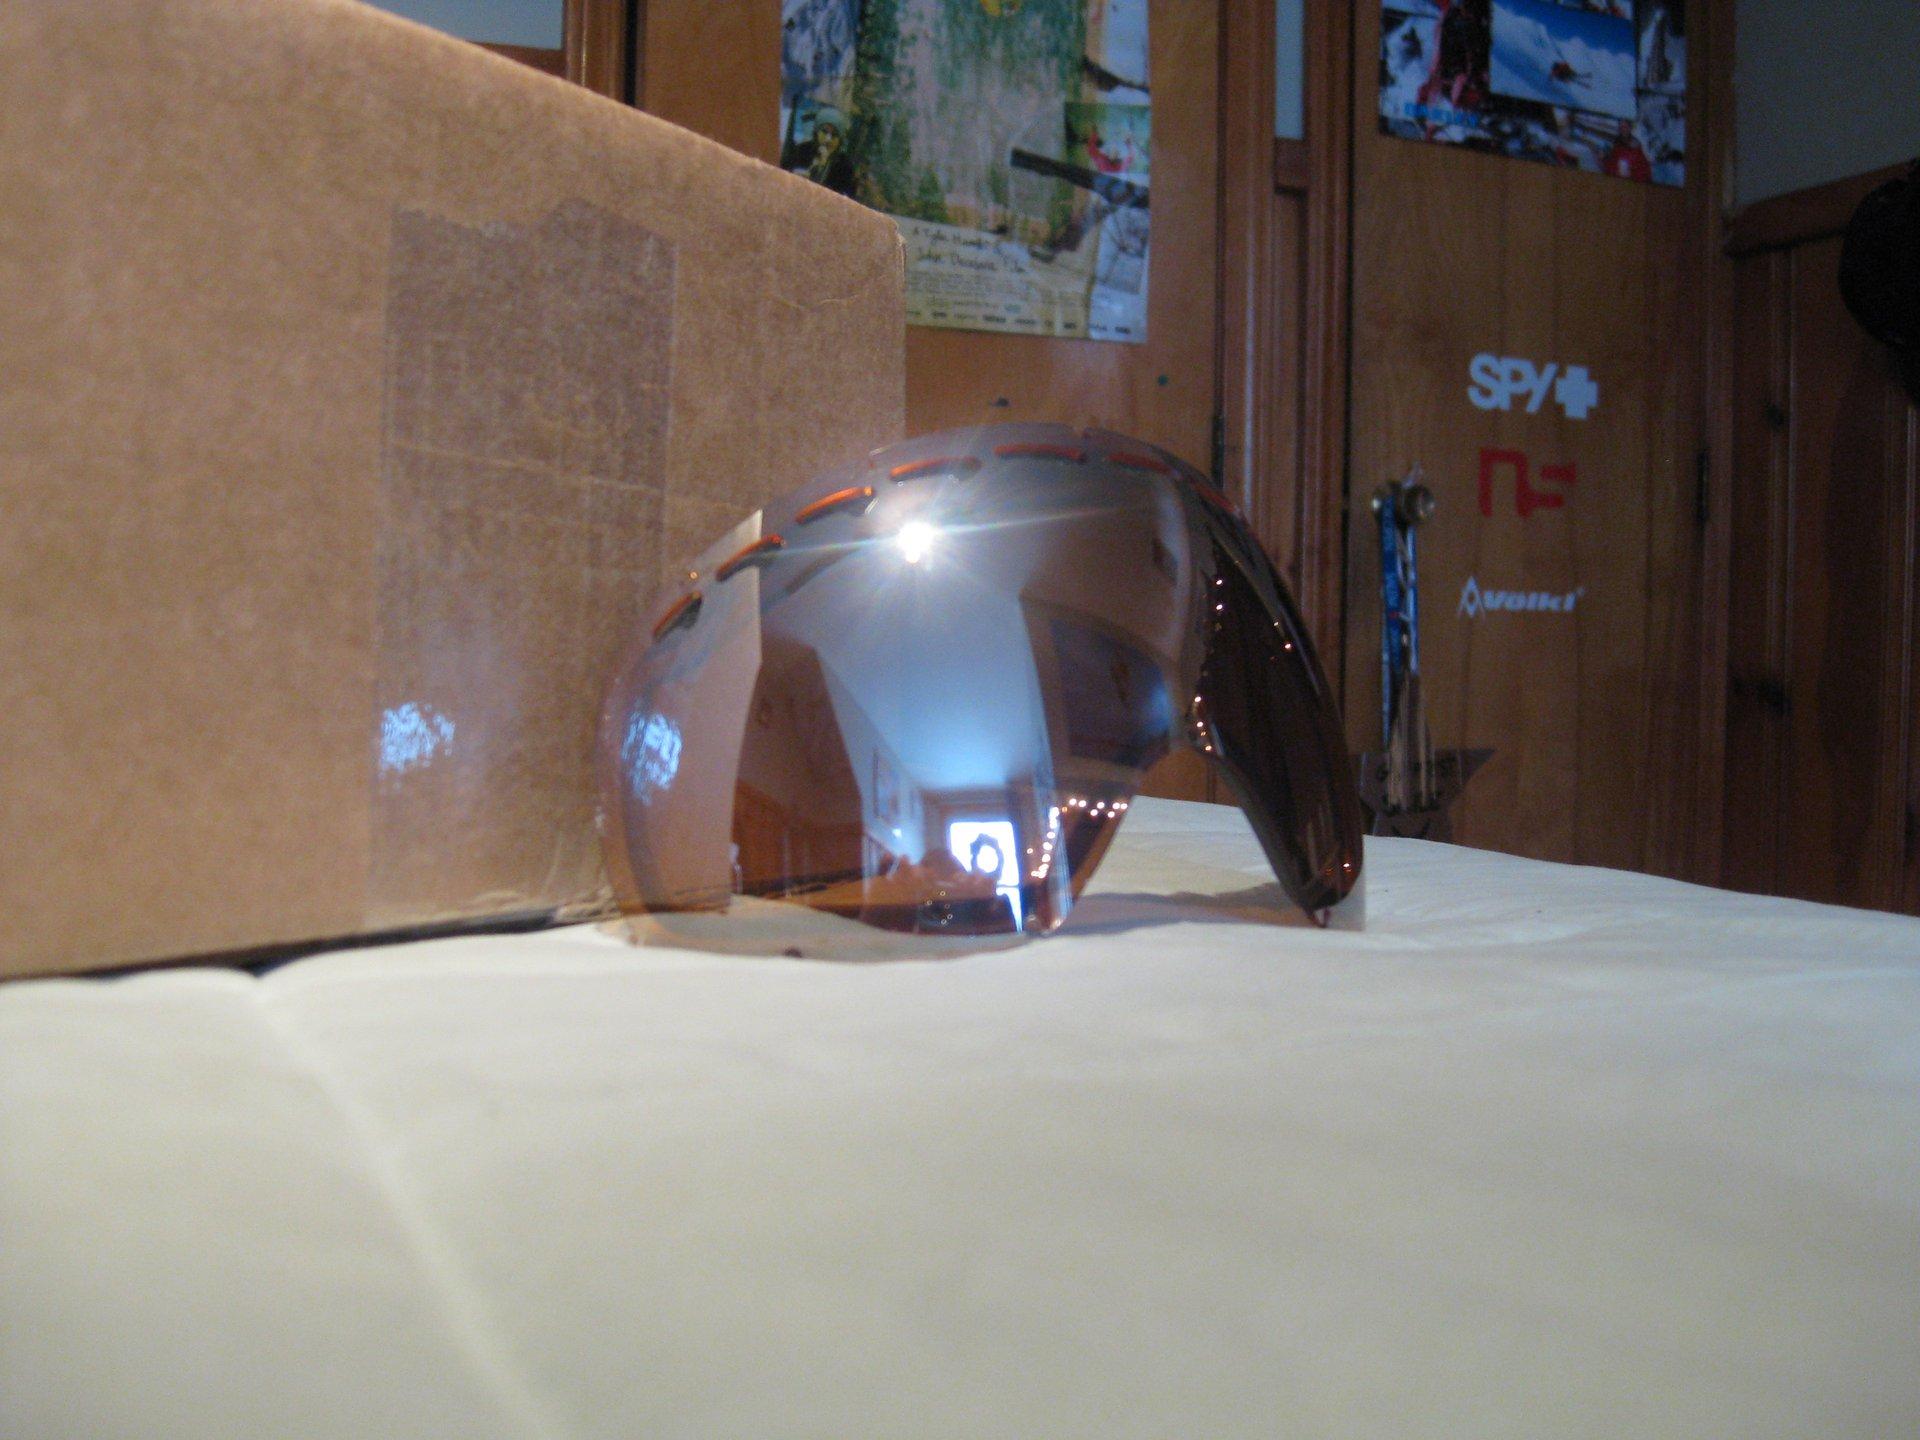 C-bar lens for sale